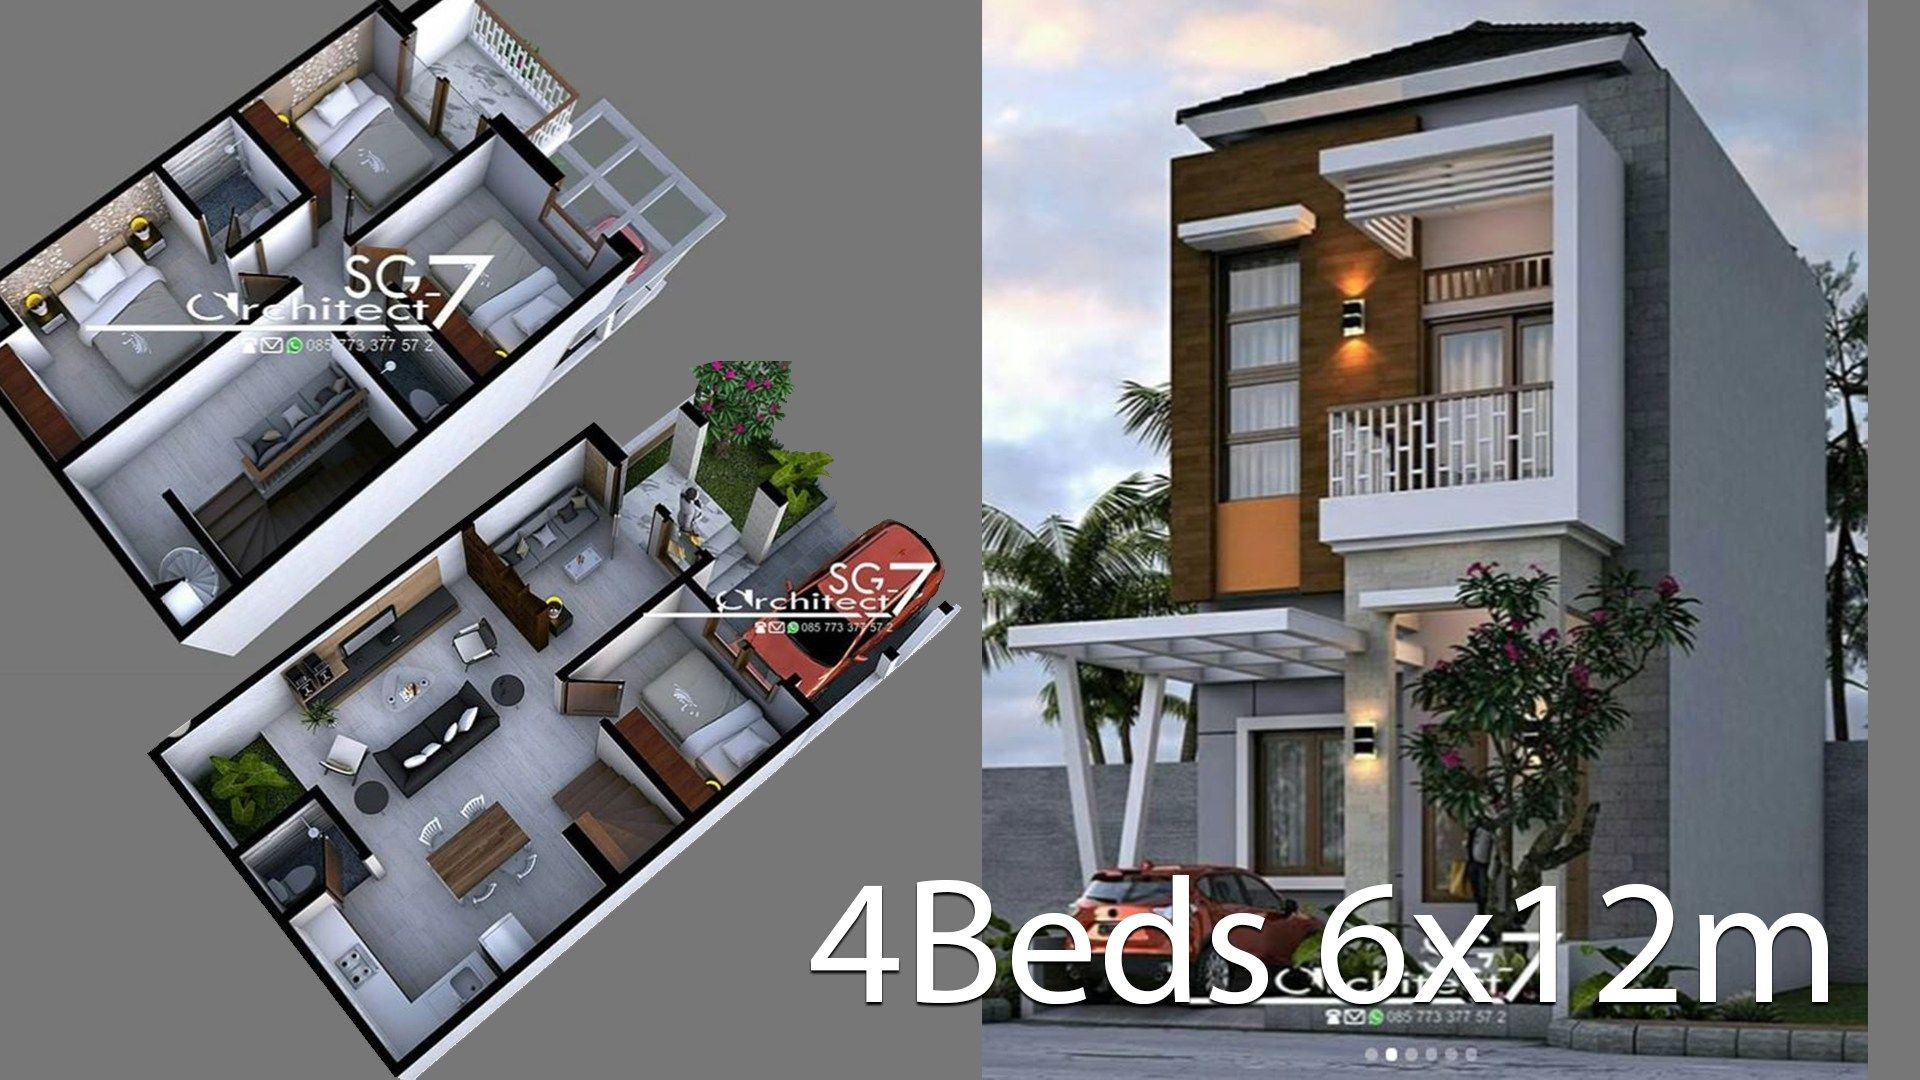 4 Bedrooms Home Design Plan 6x12m House Description One Car Parking And Gardenground Level Living Room Fam Home Design Plan Home Building Design House Design